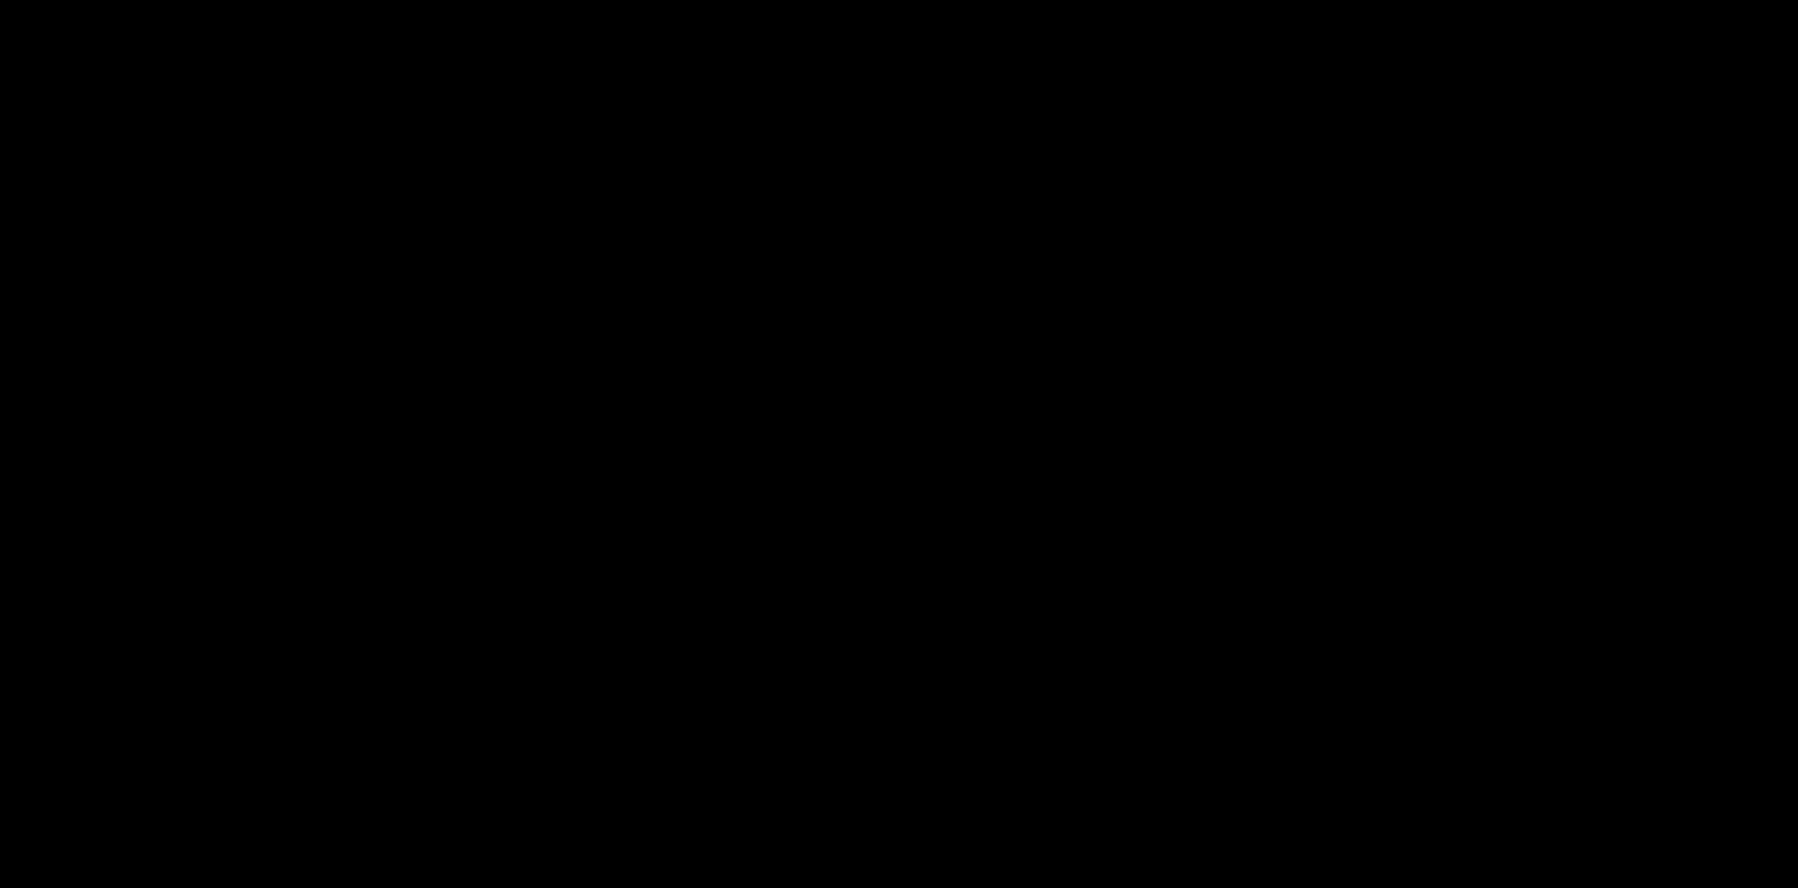 rakuten-debit